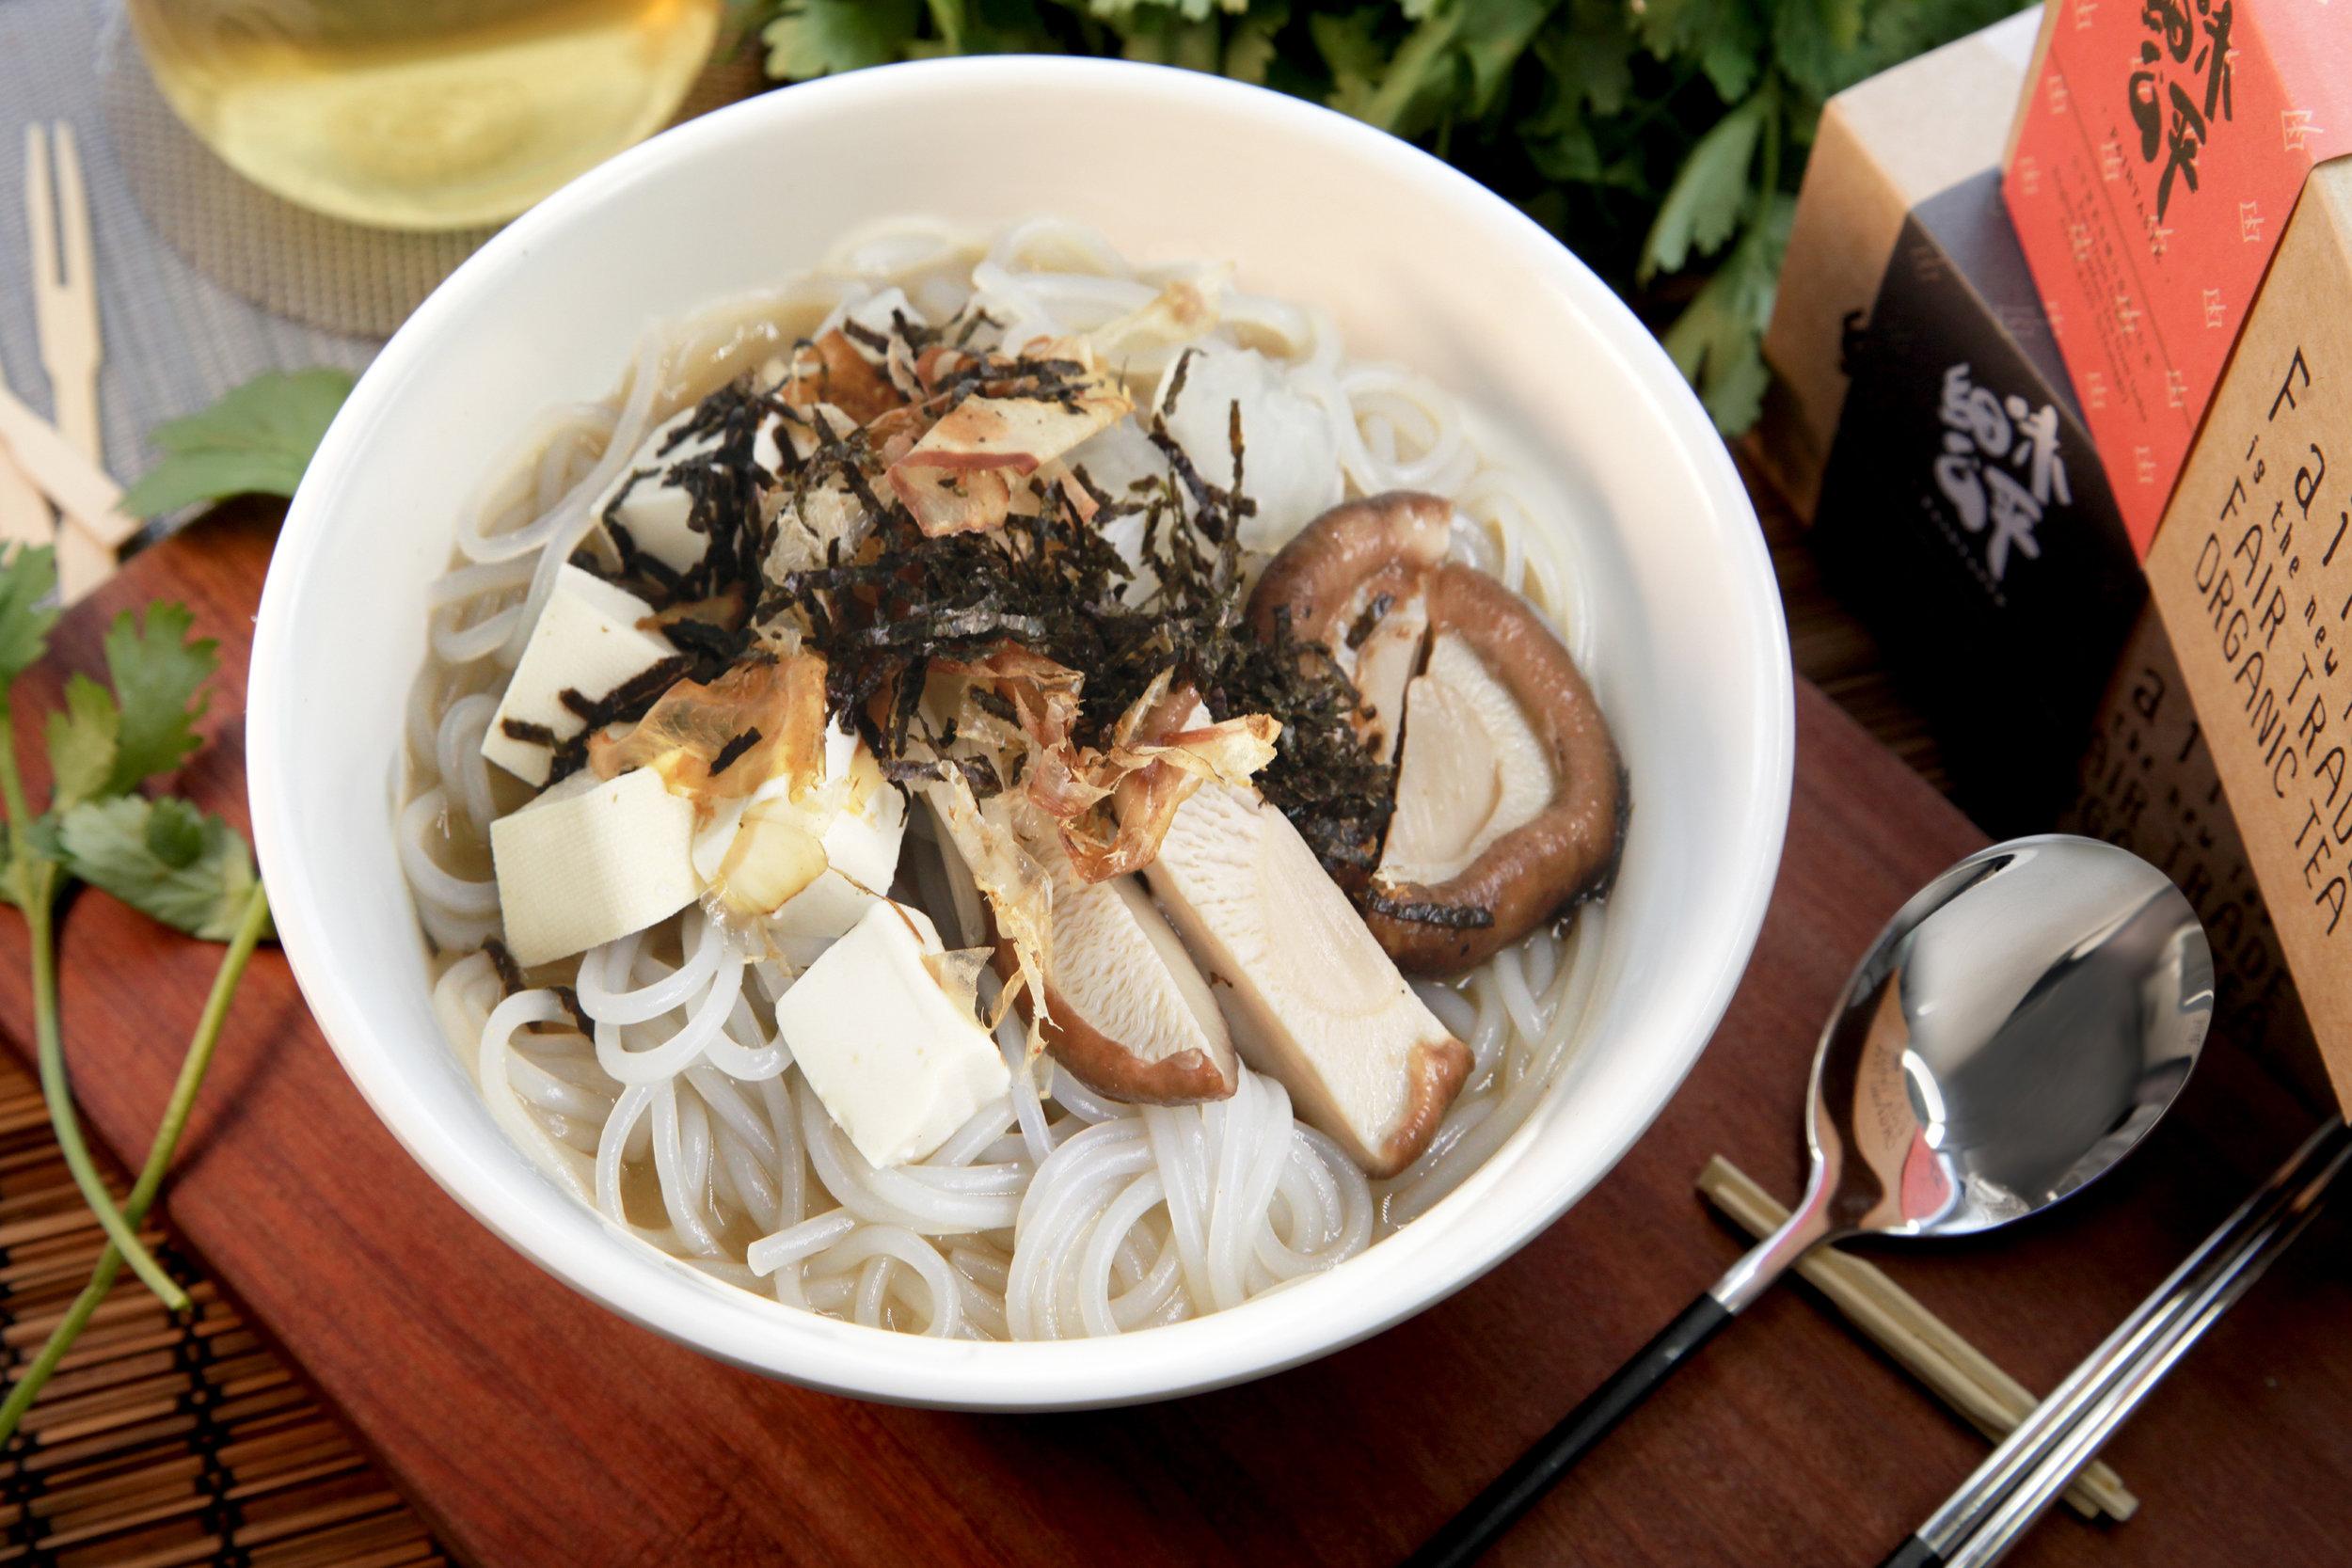 MISO NOON - 81.73 KCAL PER SERVINGMiso Paste, Yam Noodle, Seaweed, Hard Tofu, Bean Sprout, Bonito Flake, Spring Onion, Turnip, Coriander, Shiitake Mushroom.$45